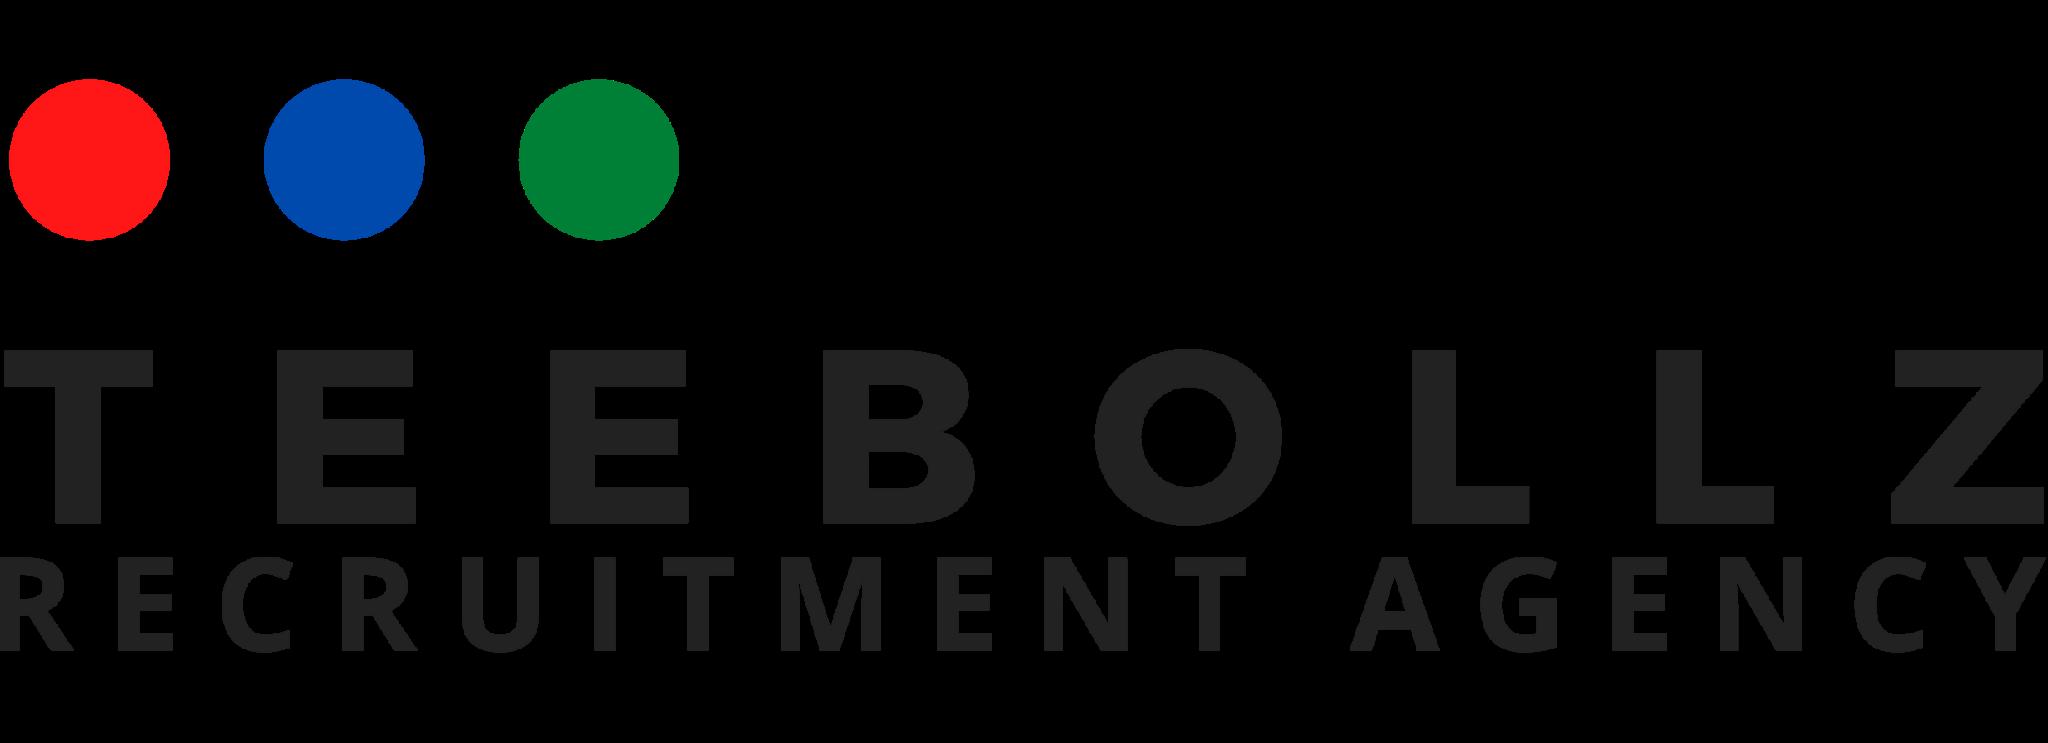 Teebollz Recruitment Agency